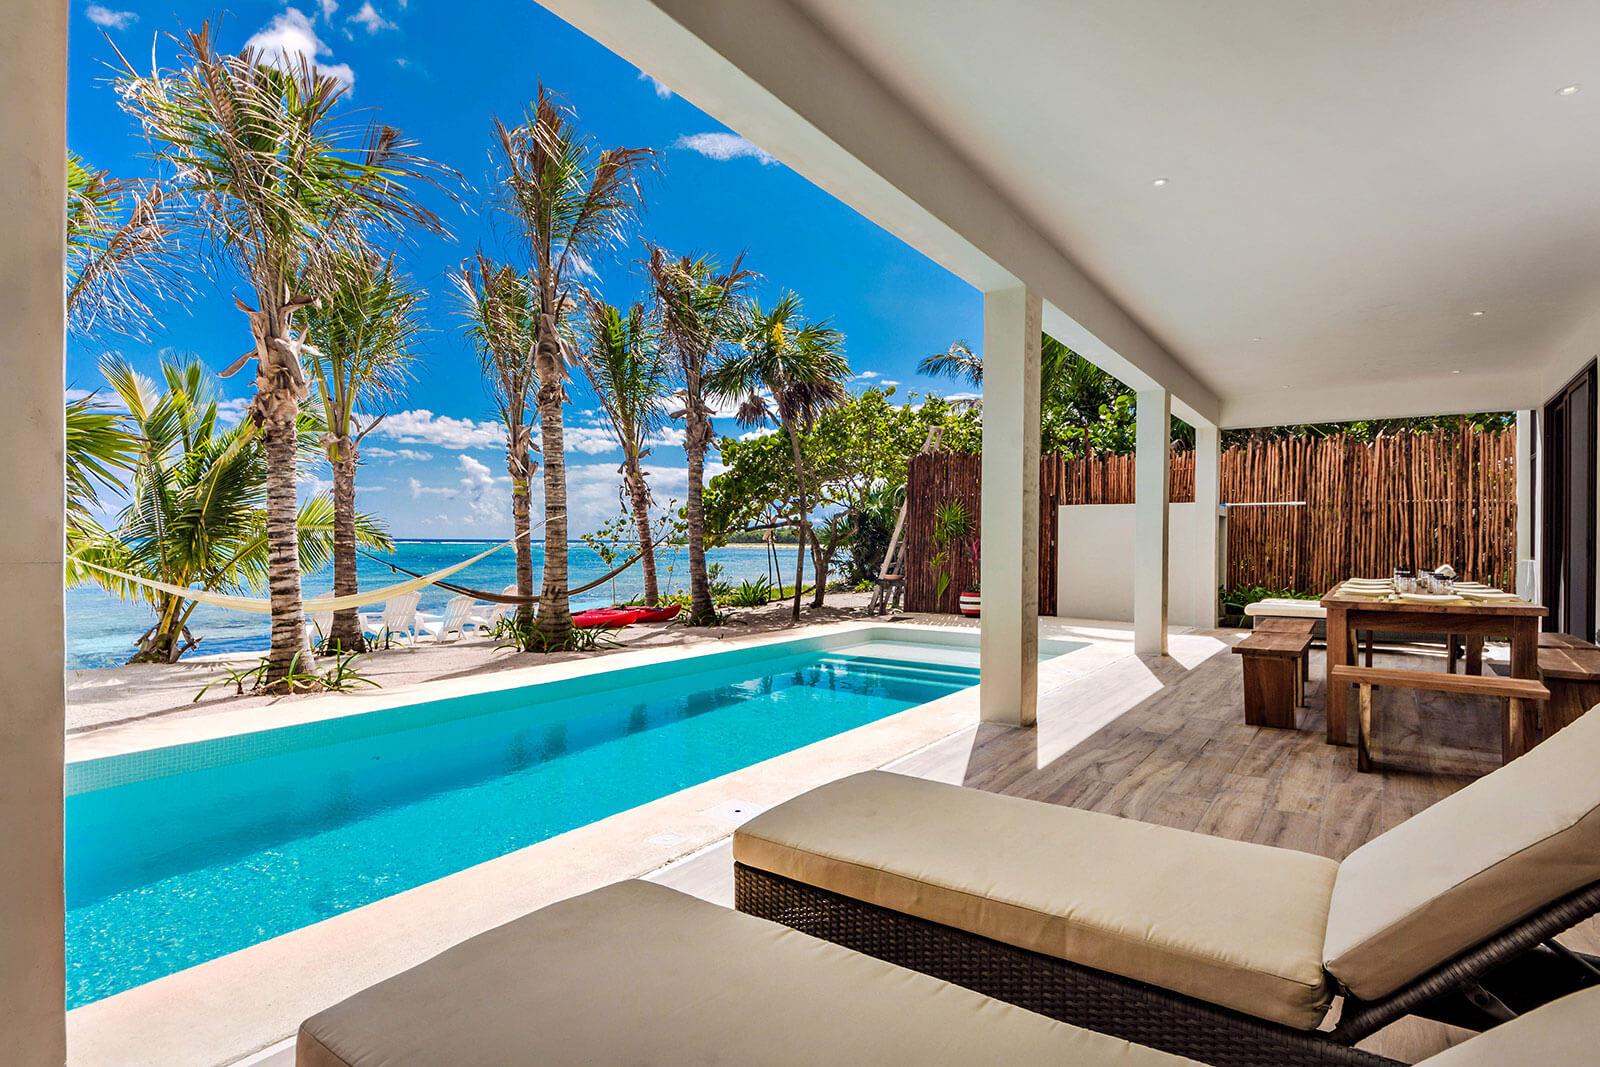 Maya_Luxe_Riviera_Maya_Luxury_Villas_Experiences_Tulum_Soliman_Bay_5_Bedrooms_7.jpg